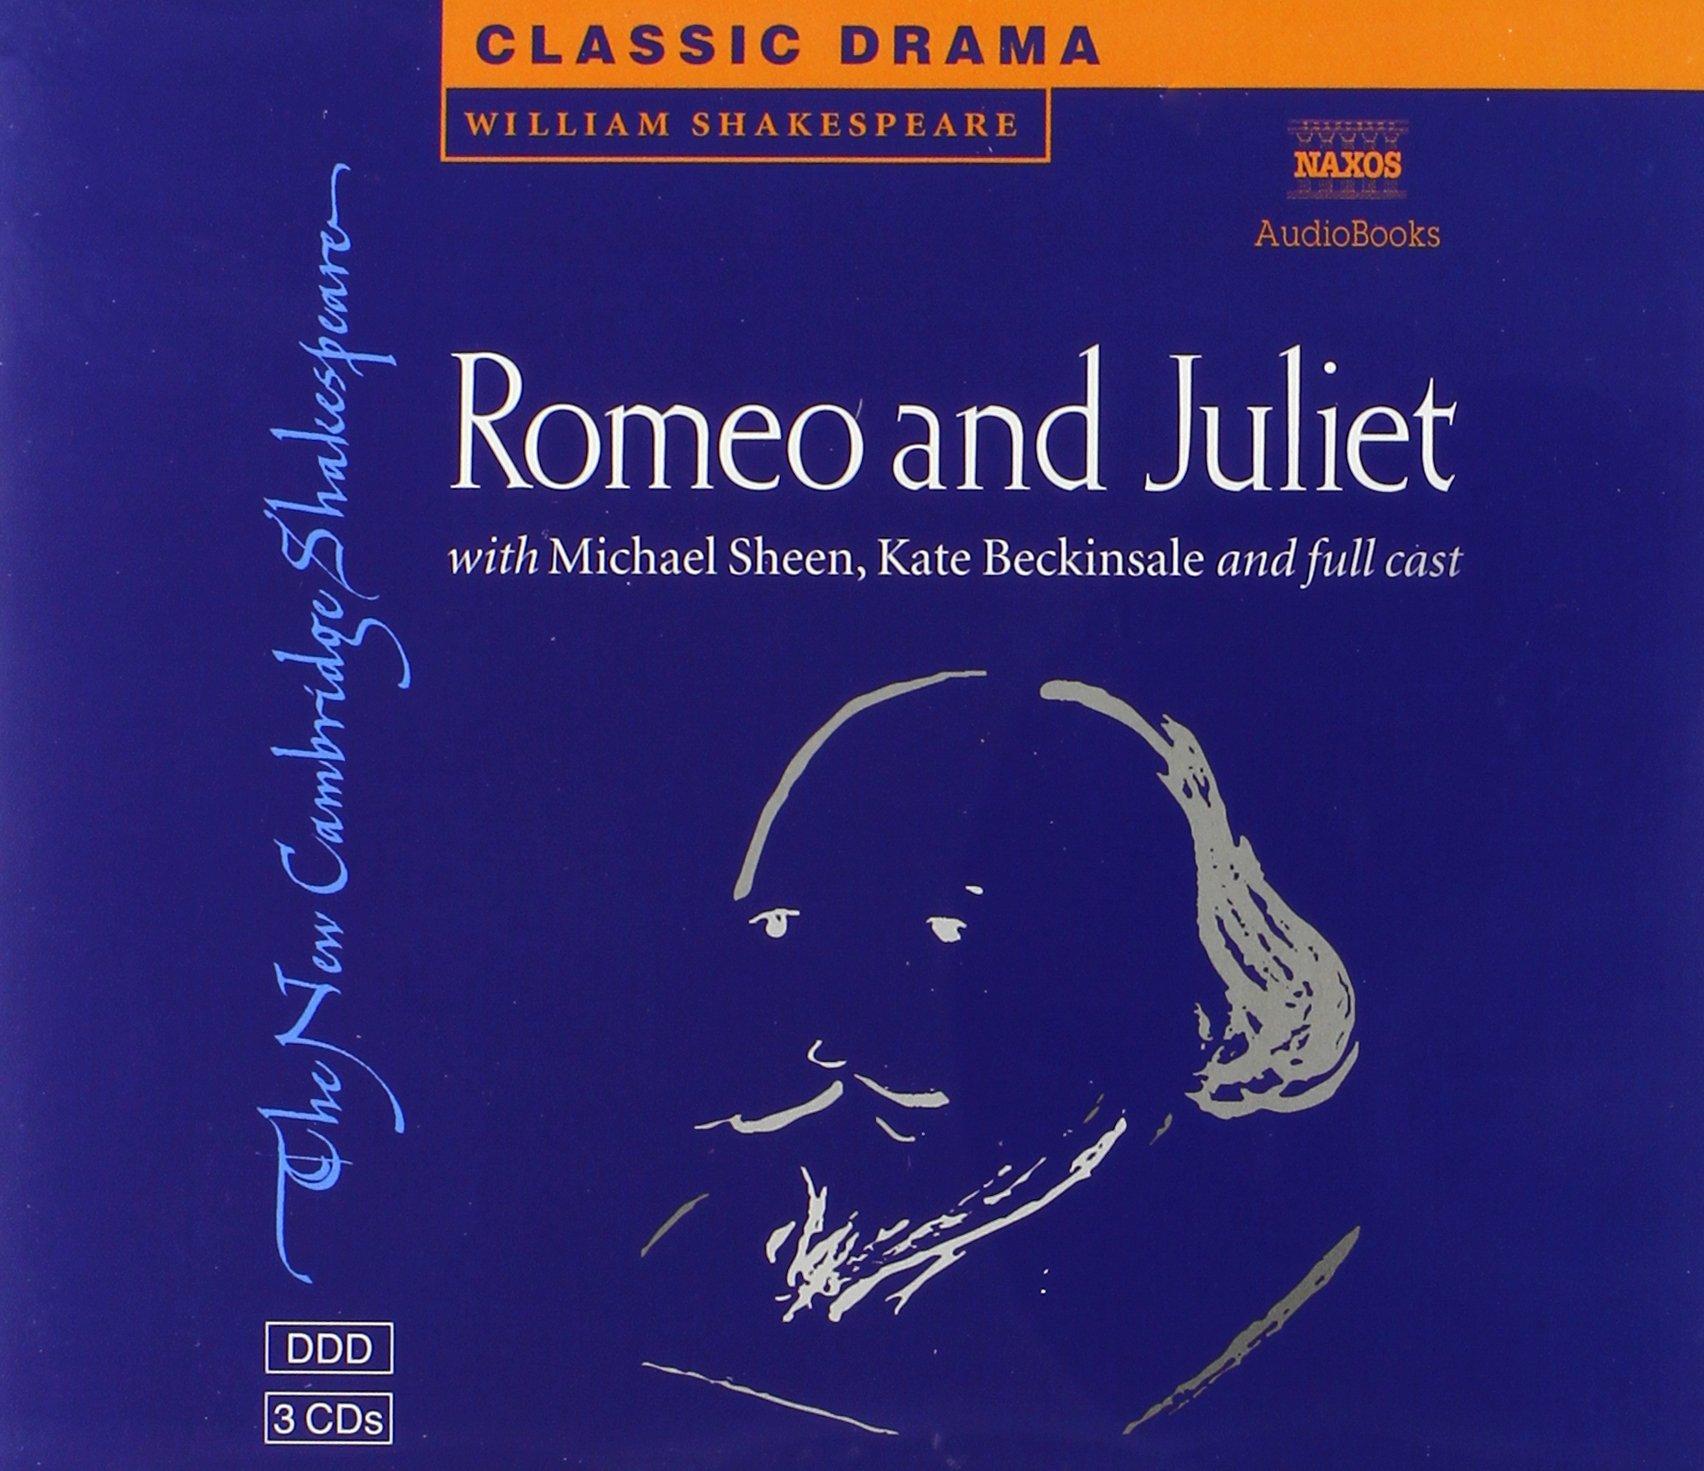 ... CD Set: Performed by Michael Sheen & Cast (New Cambridge Shakespeare  Audio): Amazon.co.uk: William Shakespeare, Naxos AudioBooks: 9780521625623:  Books